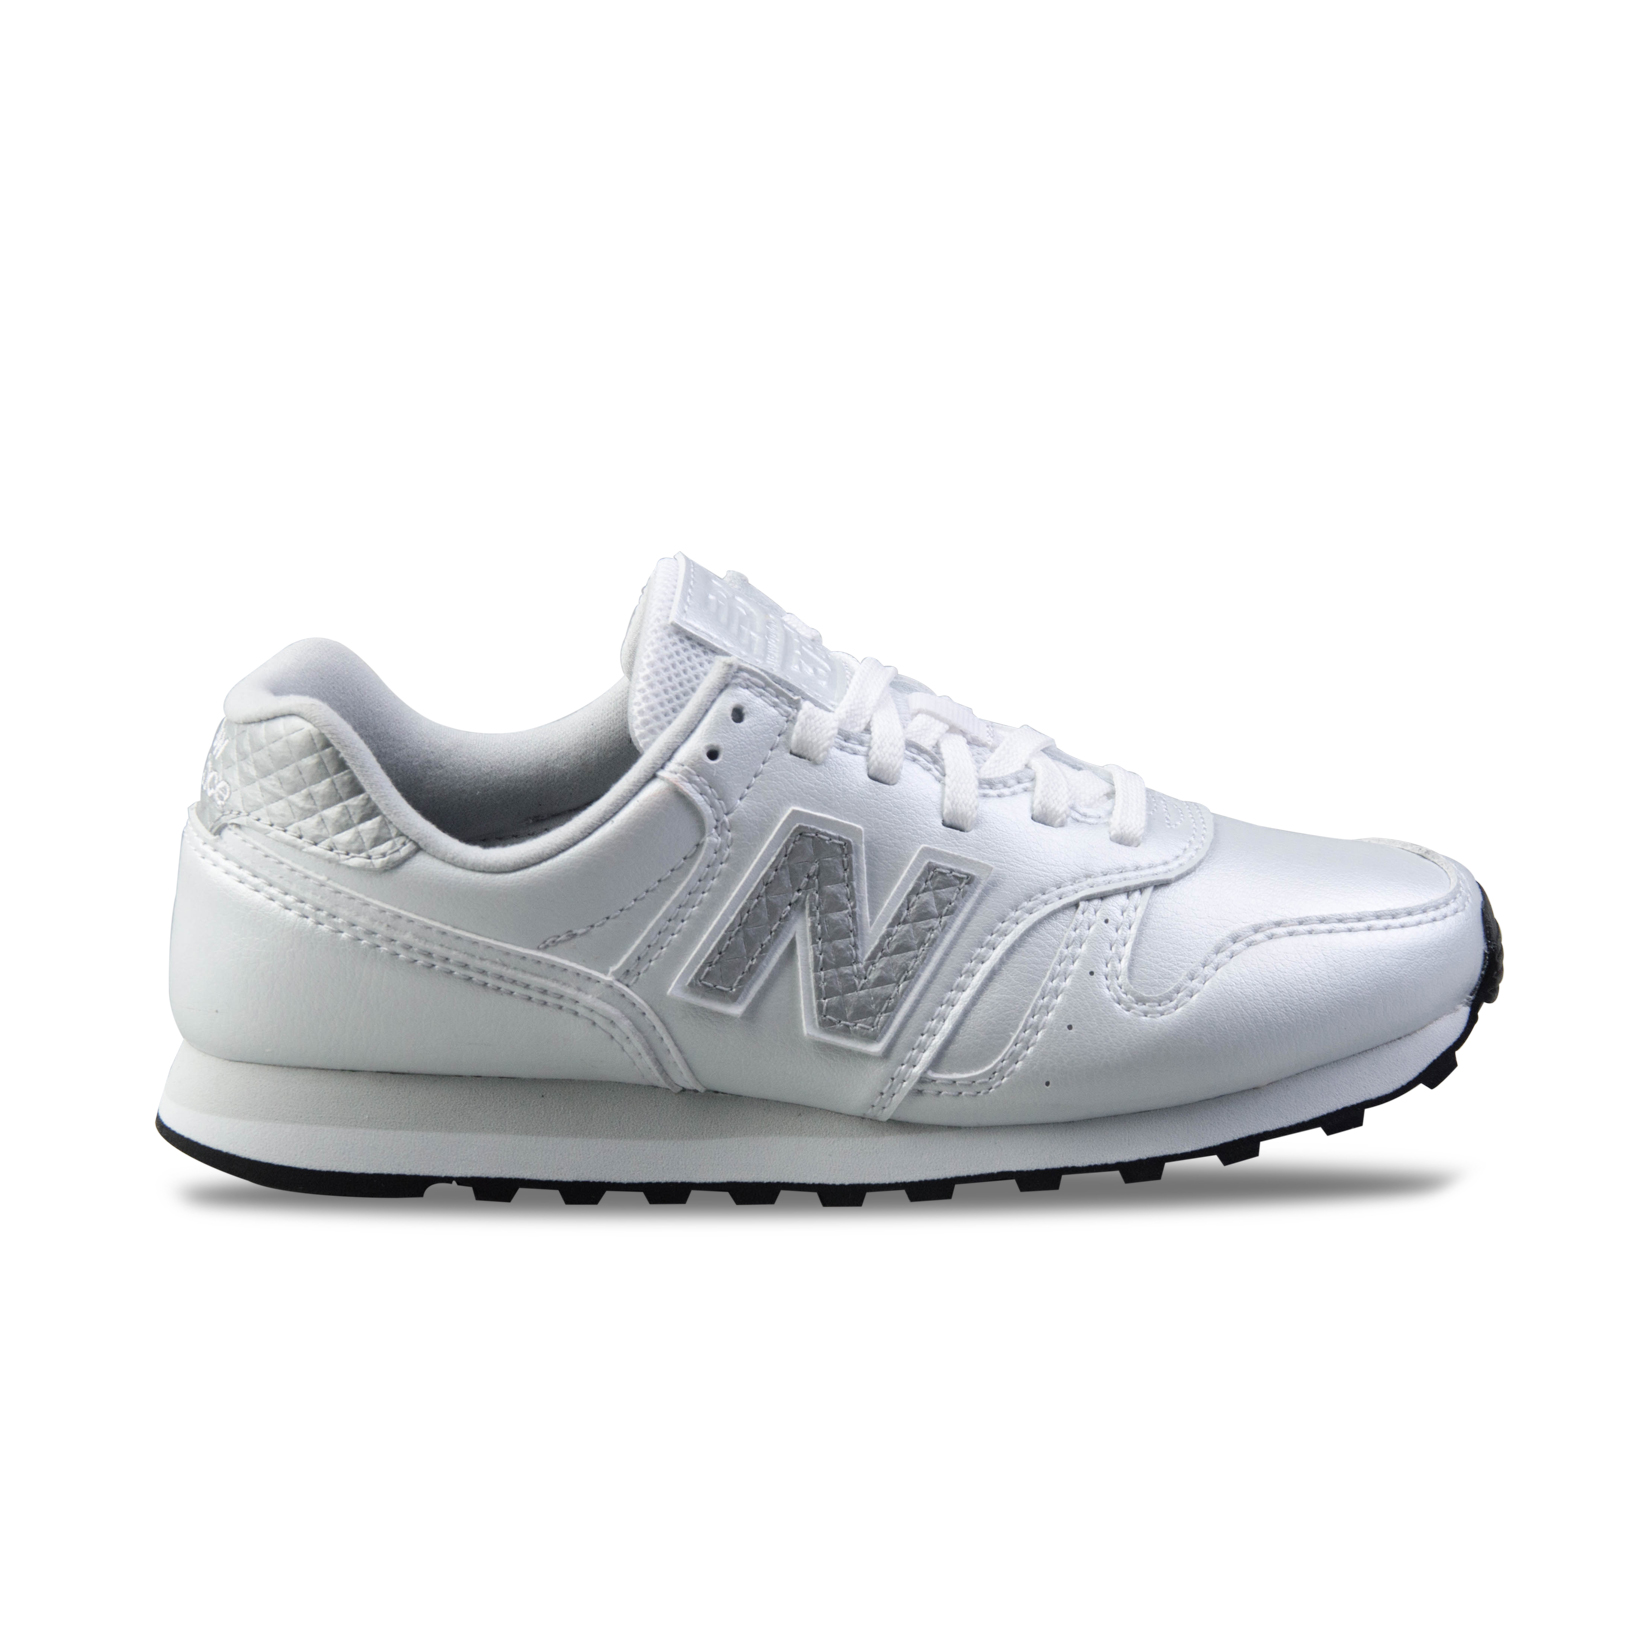 New Balance 373 Modern Leather Silver